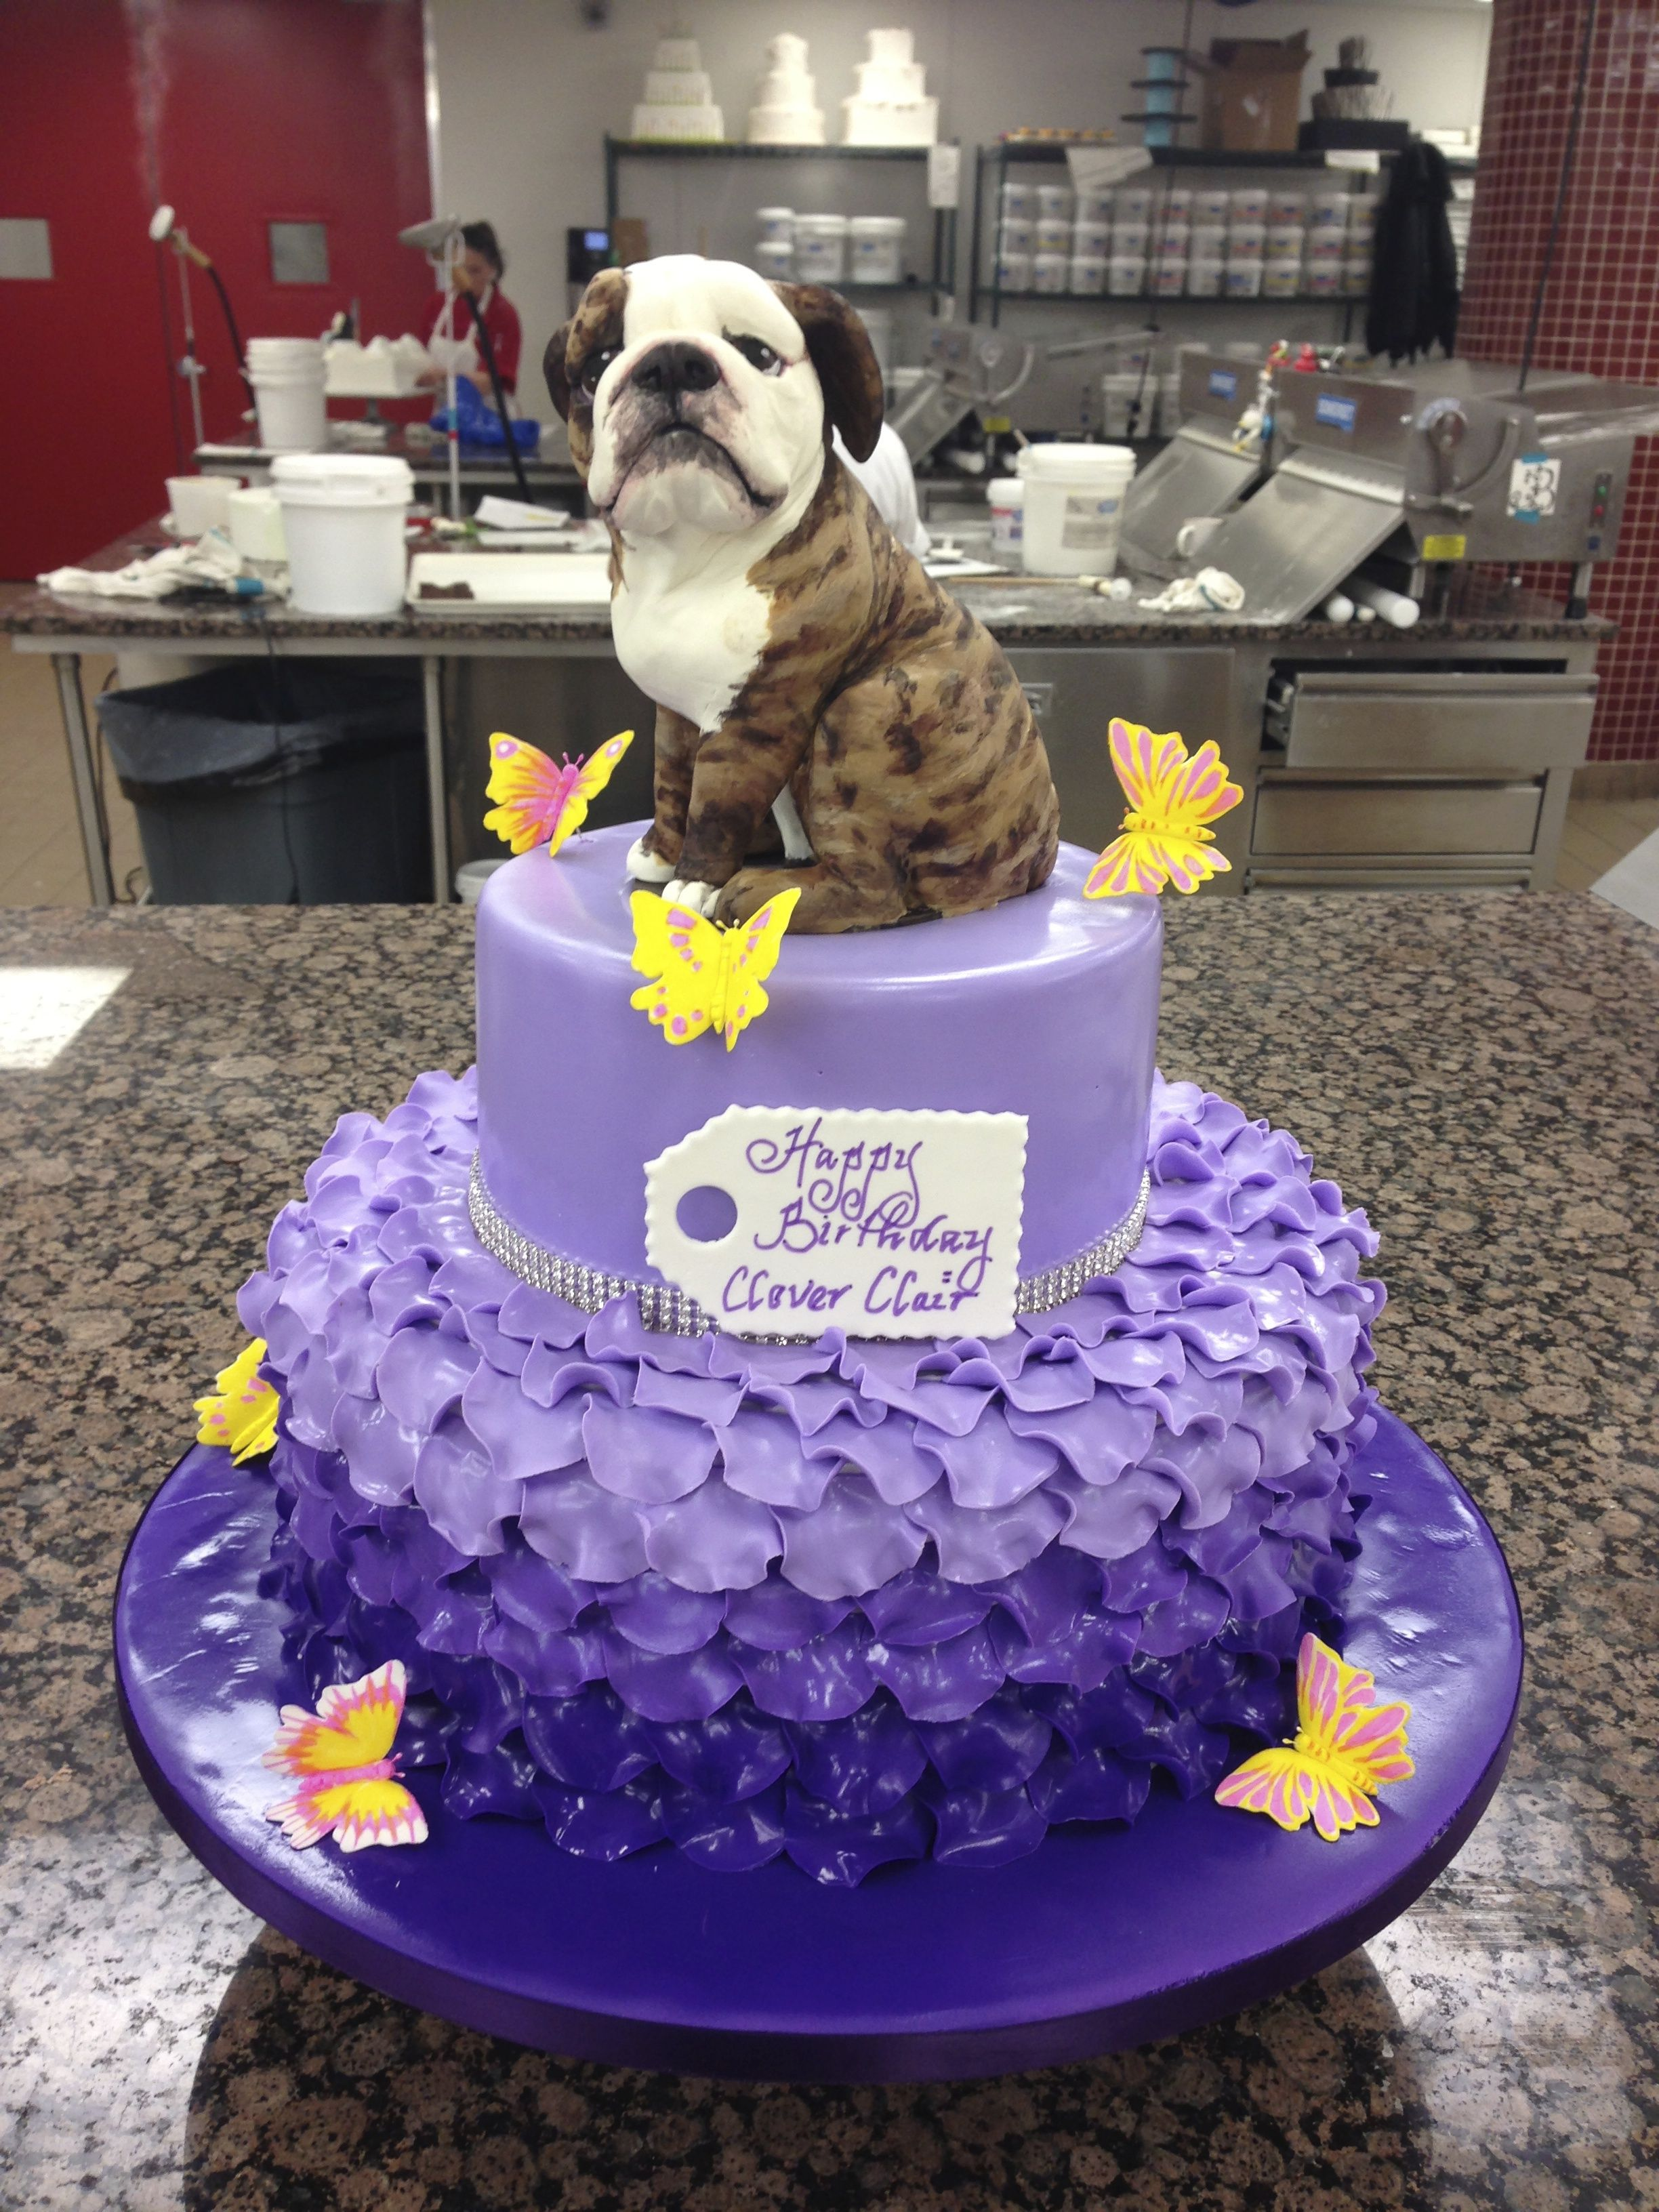 Bake Boss Cake Decorating : bulldog cake decorations Pin English Bulldog Cake ...